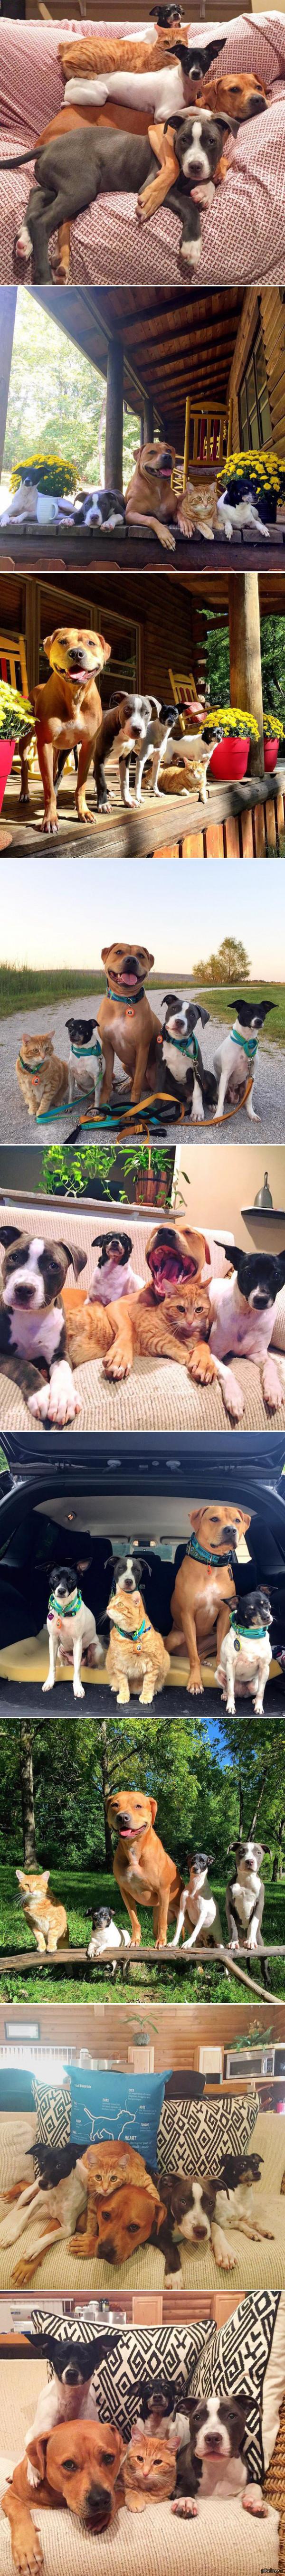 Великолепная пятерка друзей. Roxy, Edith, Mia, Rose и Jake.